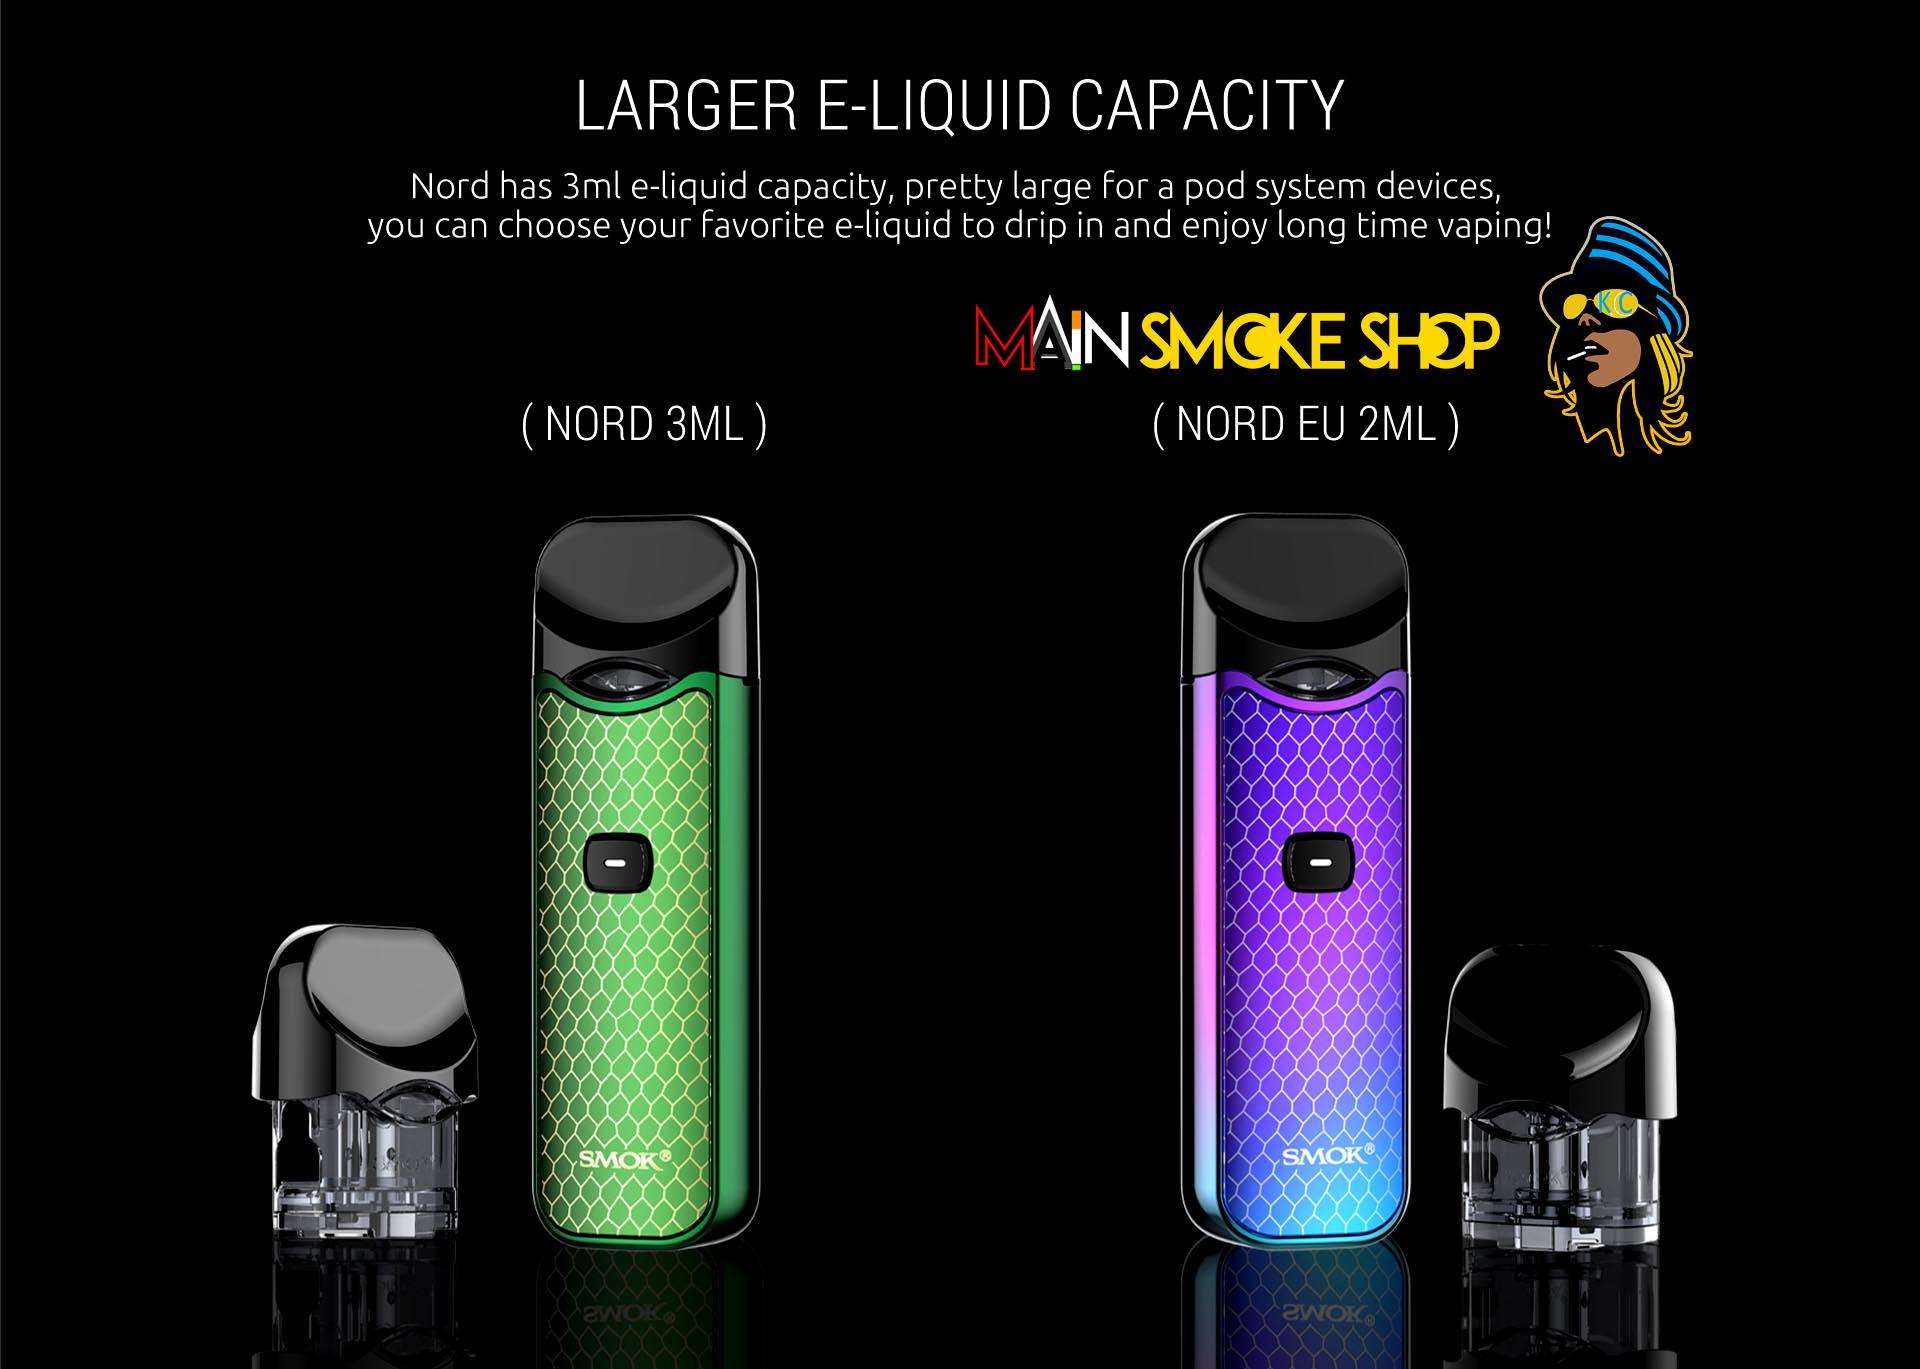 E liquid capacity